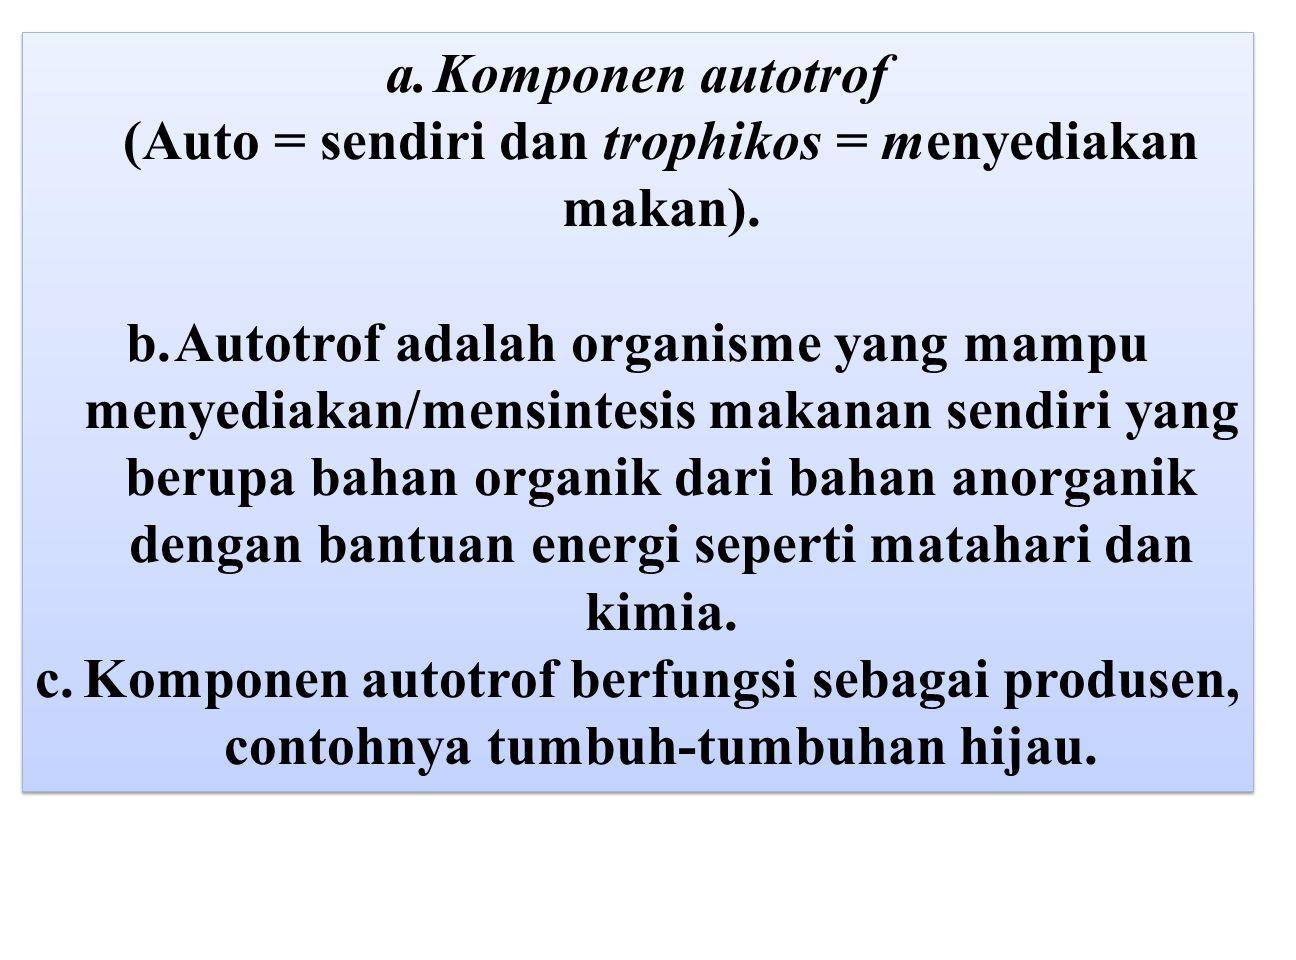 Komponen autotrof (Auto = sendiri dan trophikos = menyediakan makan).